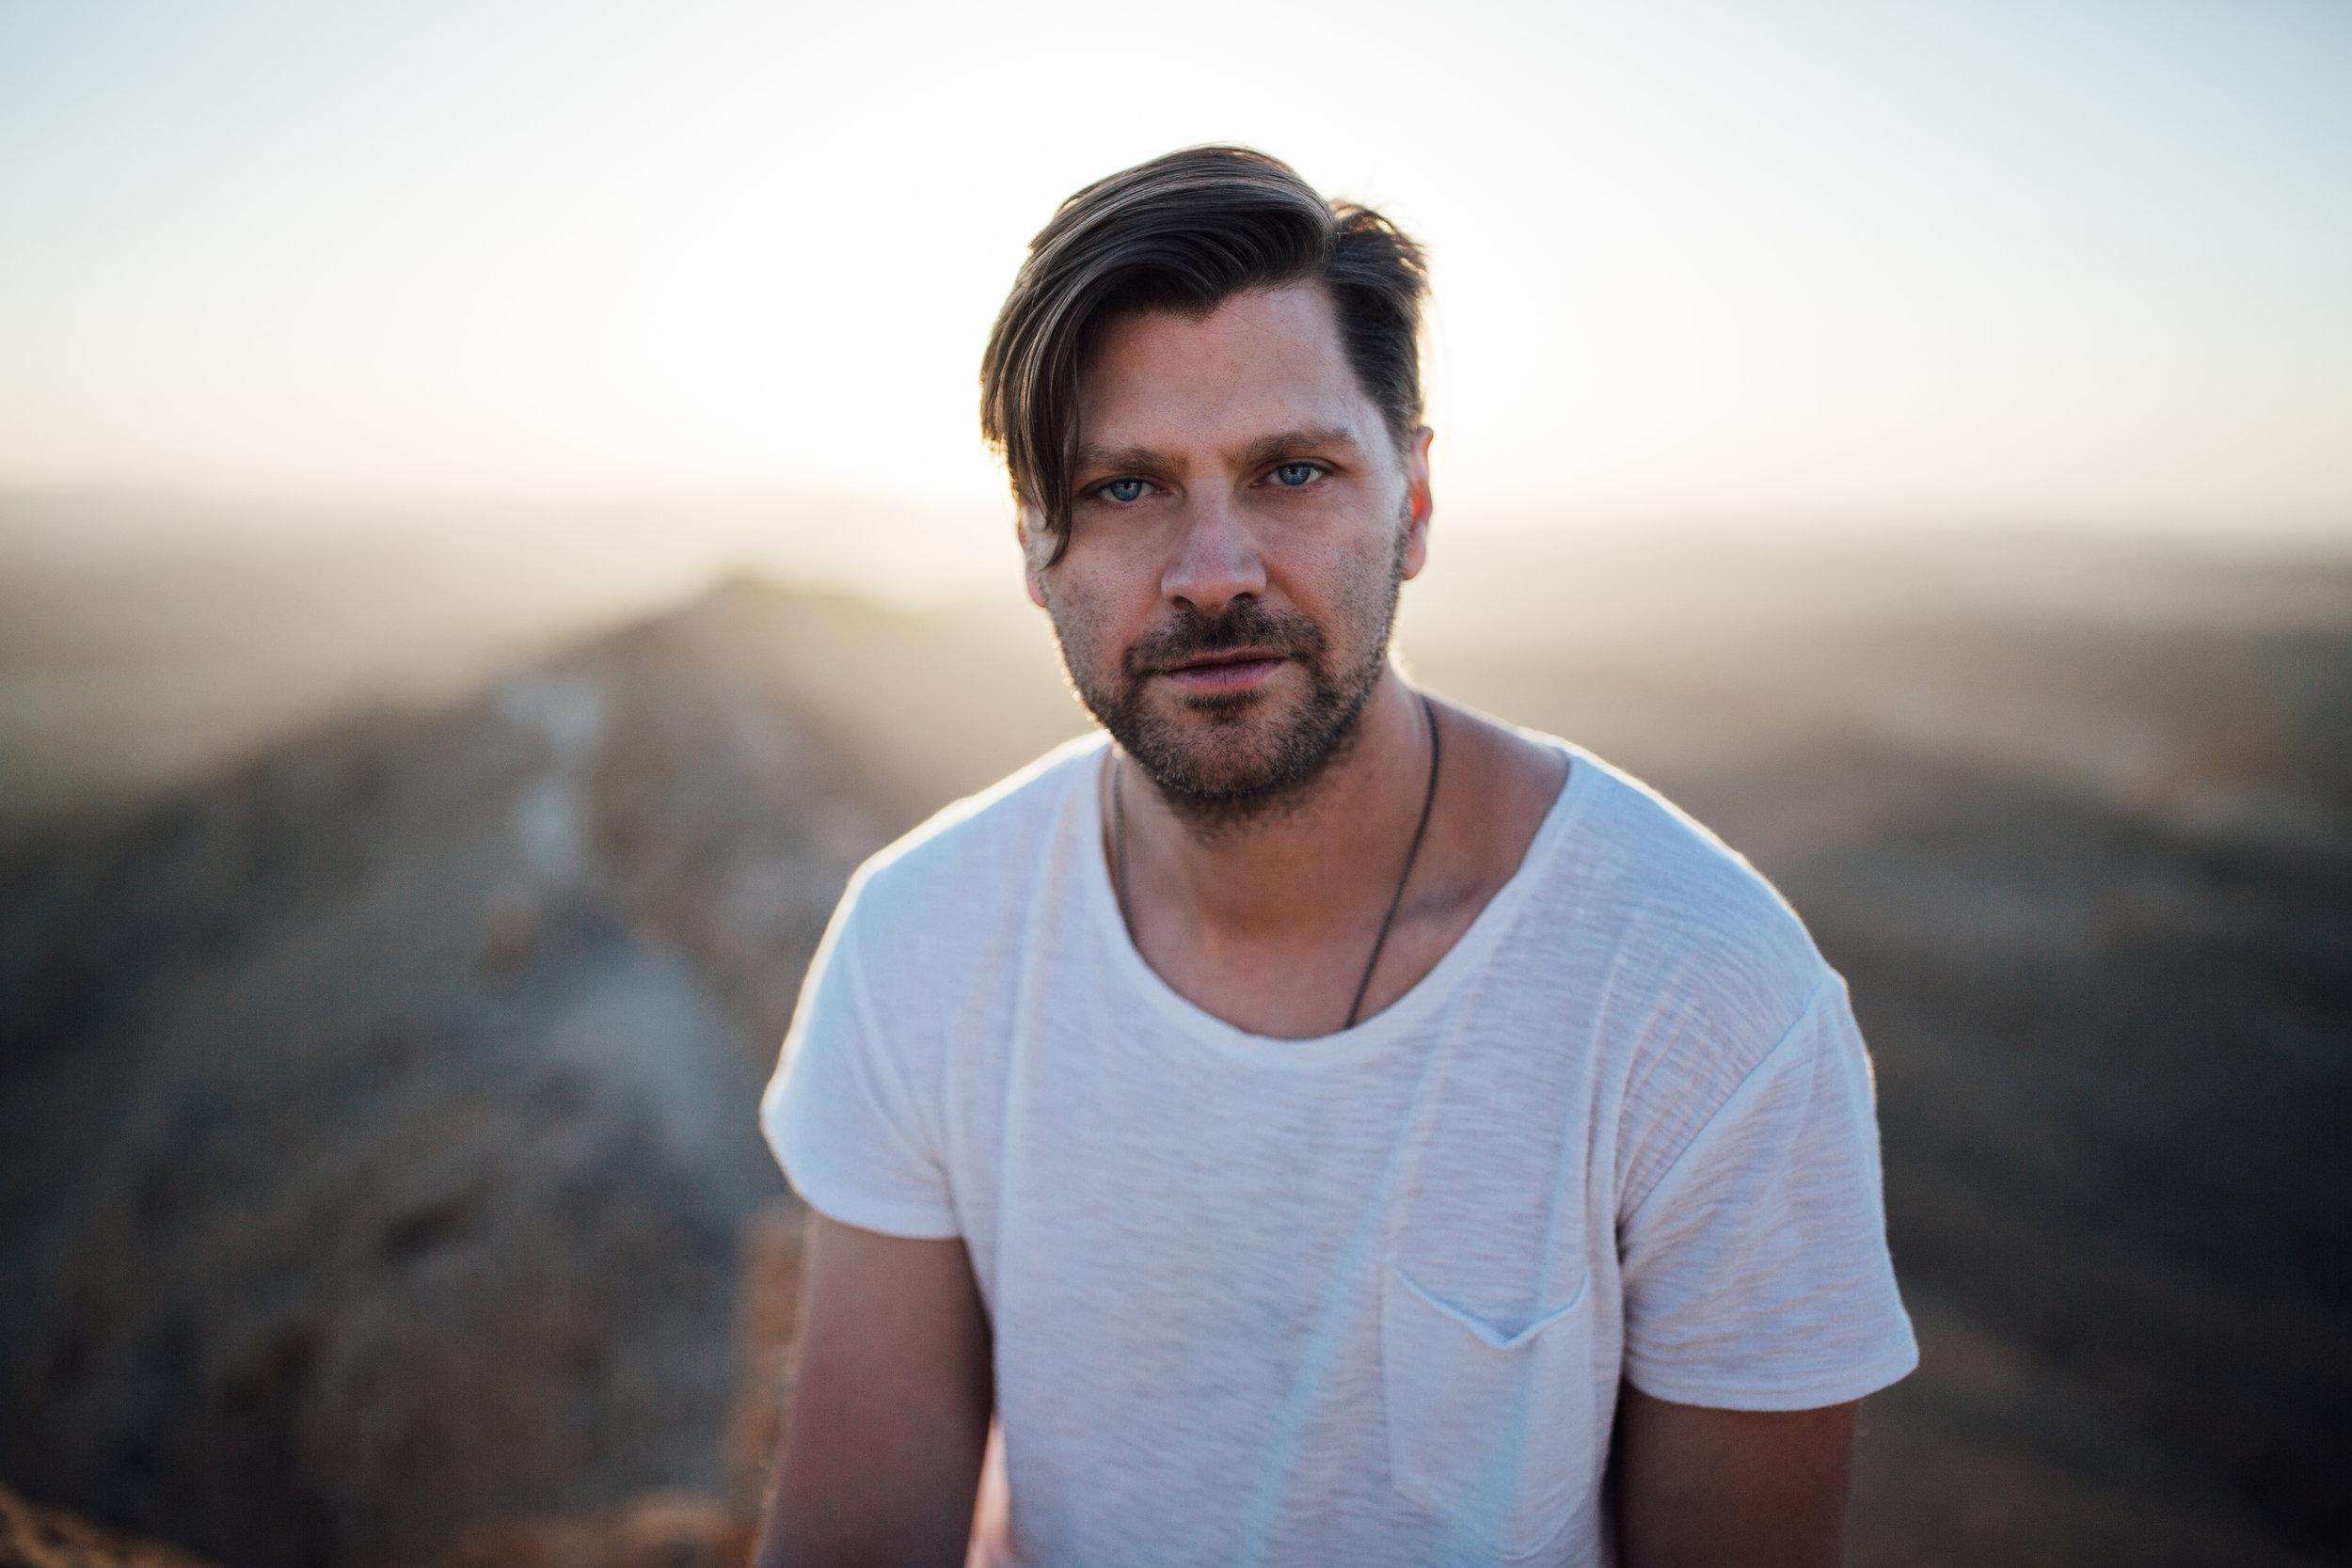 Scott Bakken is a photographer and entrepreneur based in Calgary, Canada. Follow along  @scottcbakken.